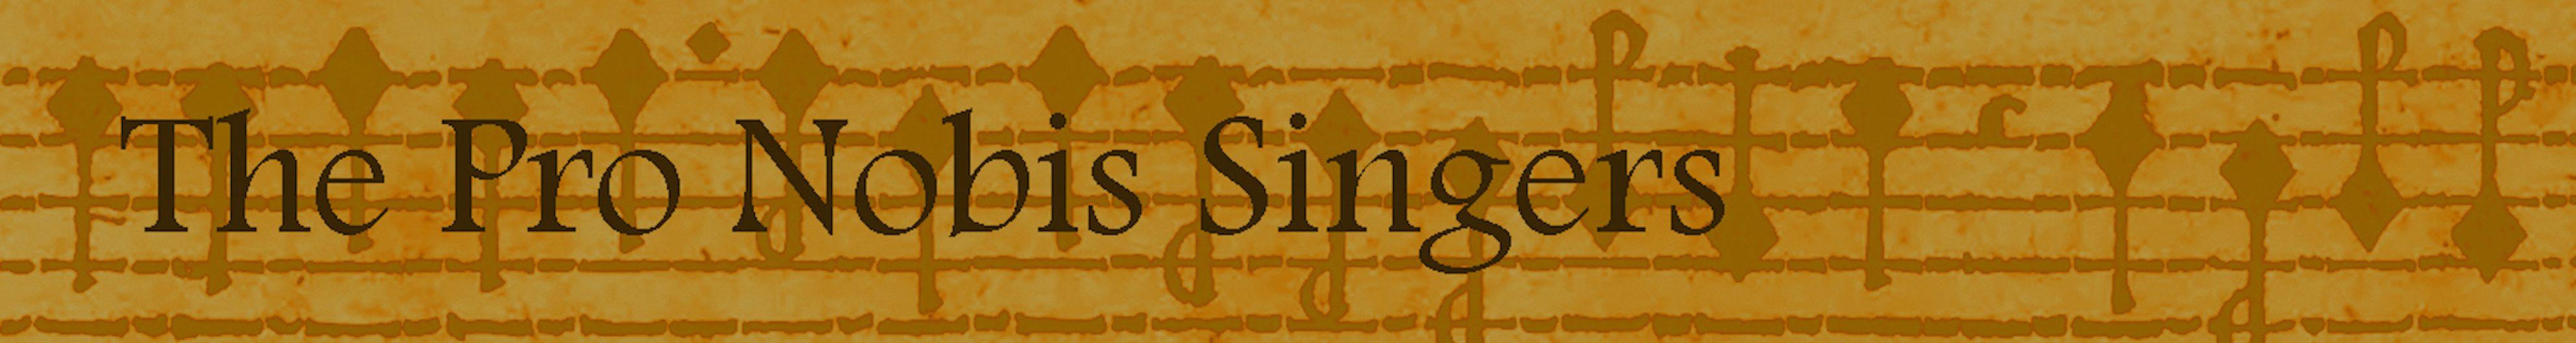 The Pro Nobis Singers